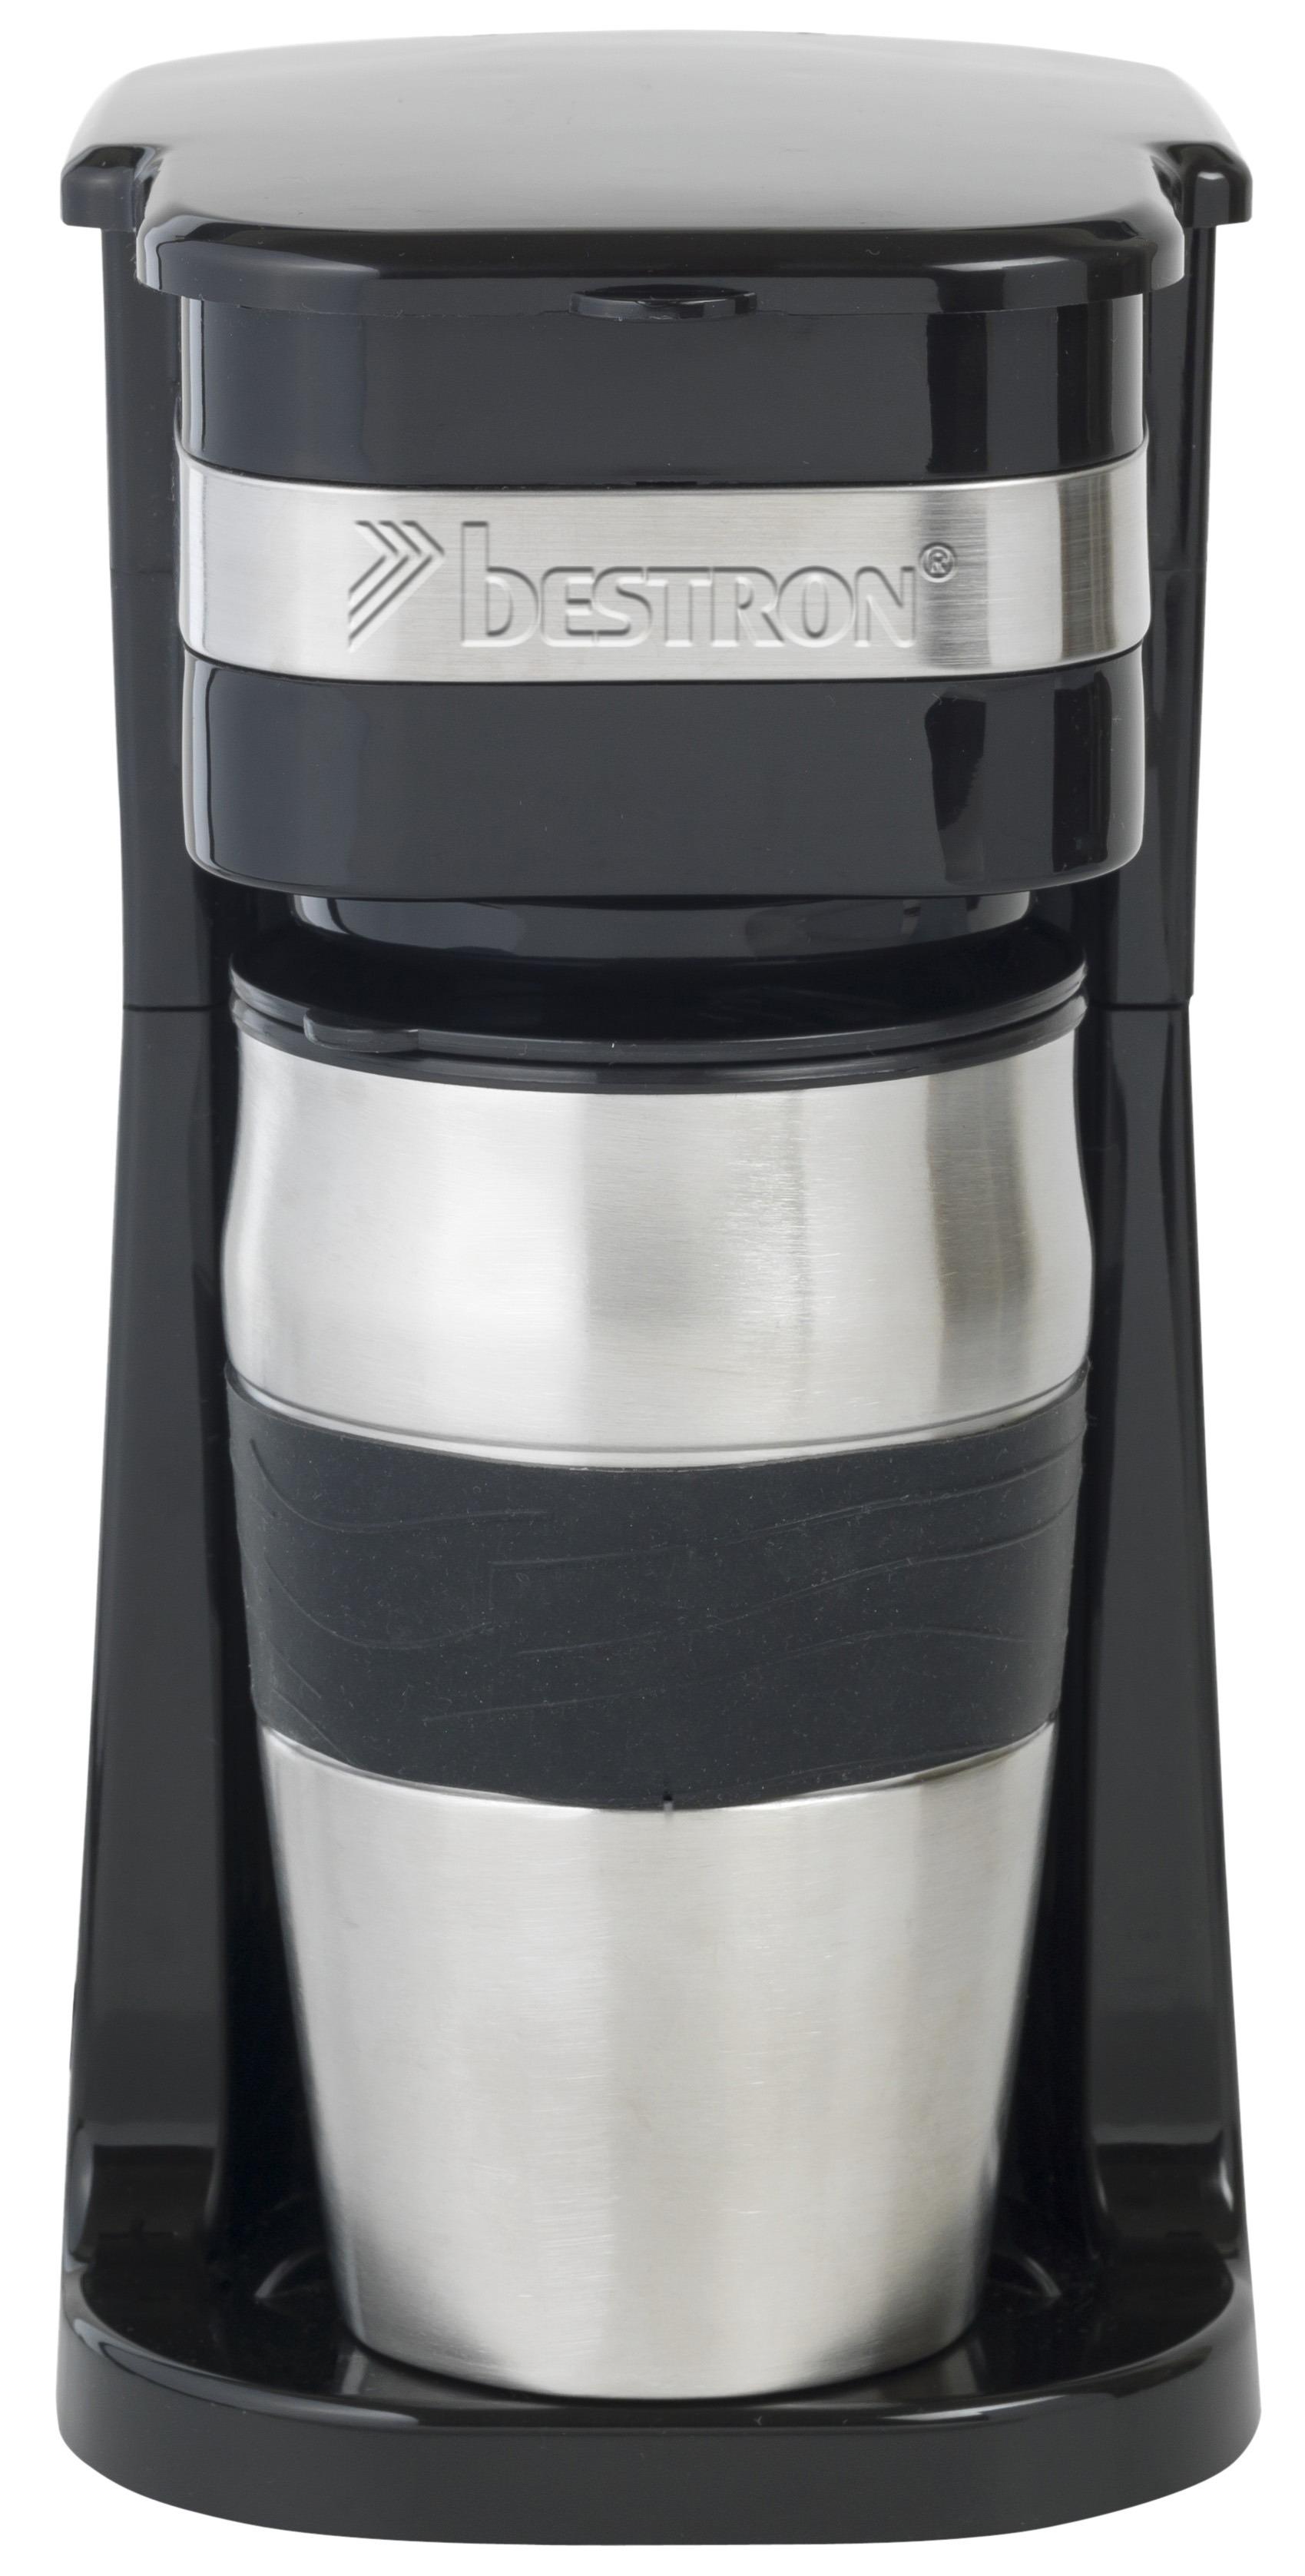 Bestron koffiefilter apparaat ACM111Z